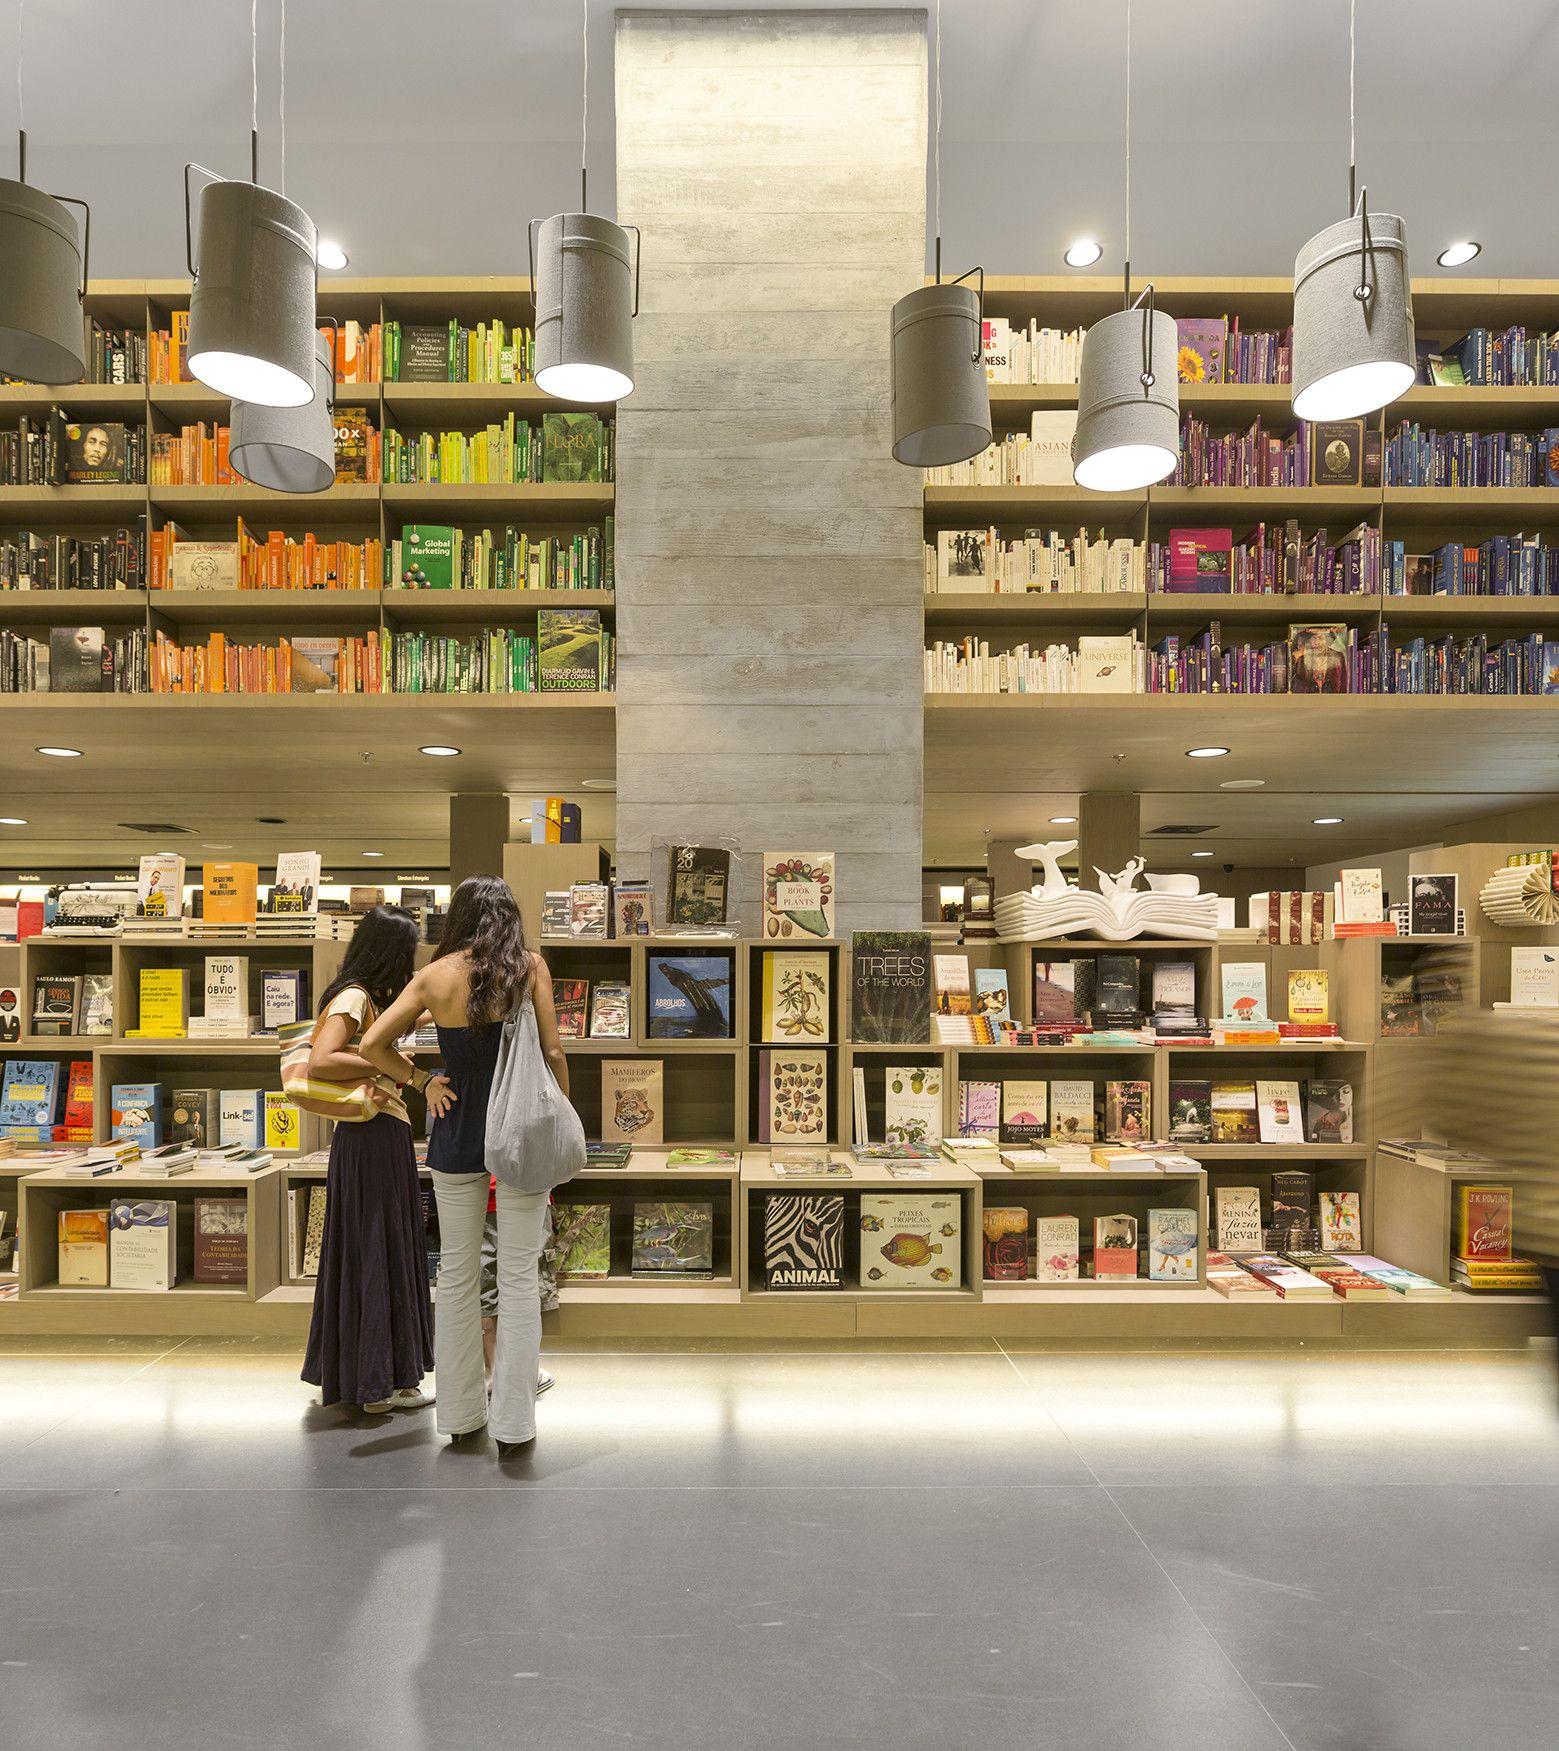 european childrens bookstore conference - HD1559×1751